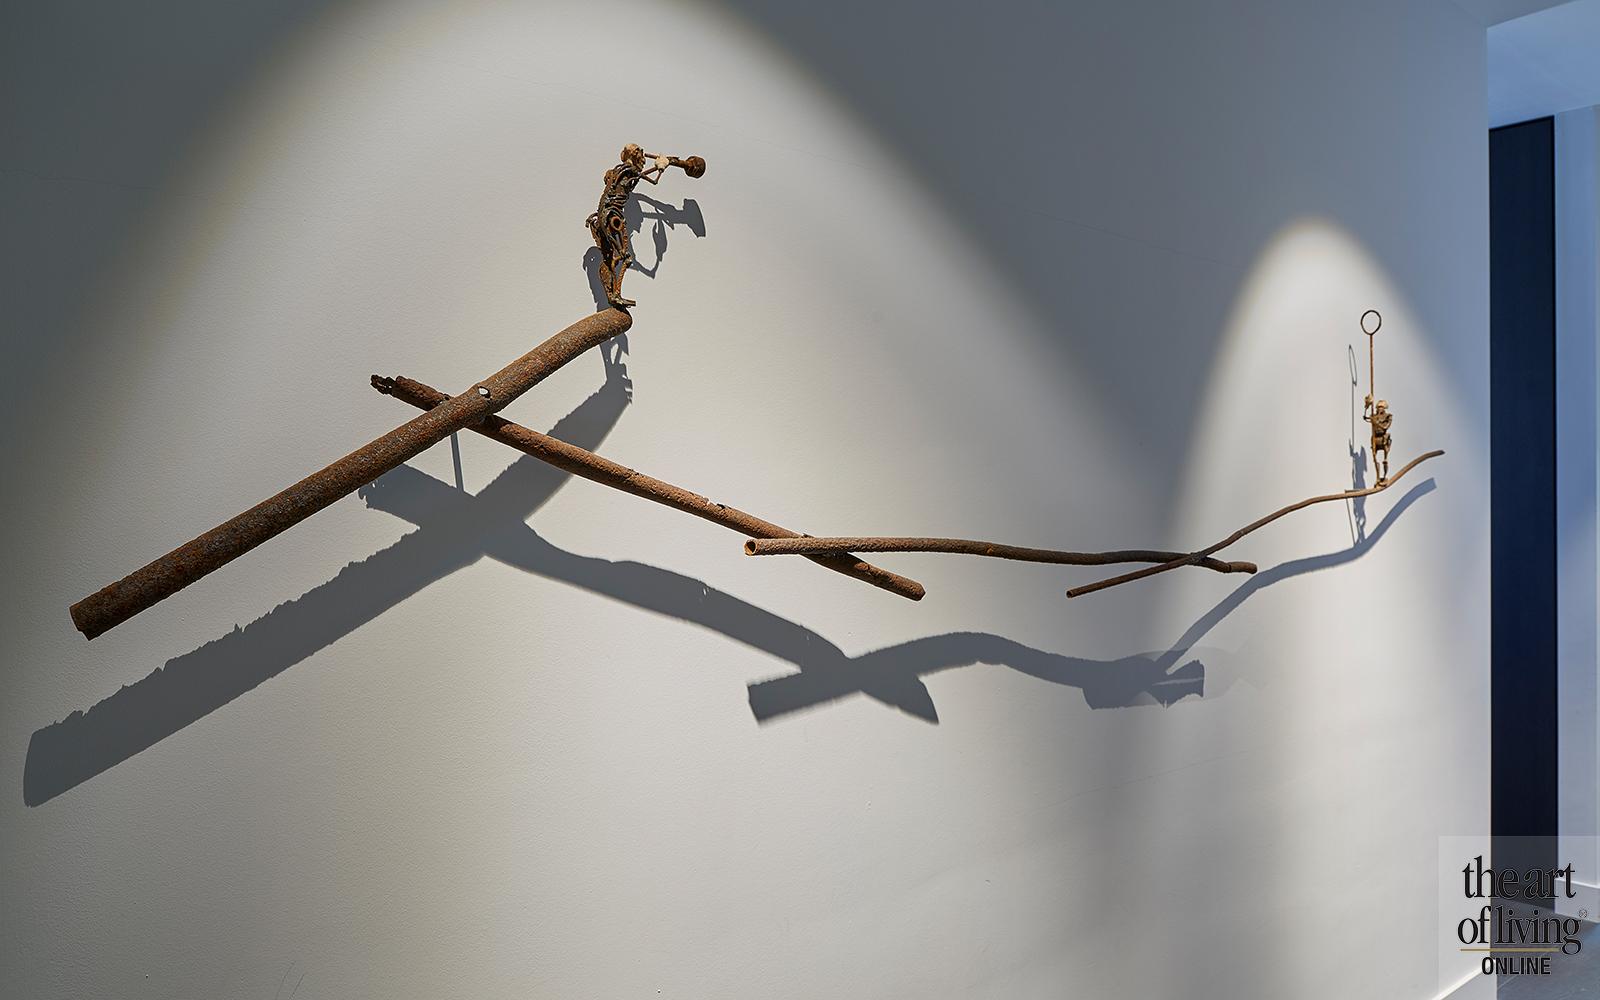 Barry Broekhuijse | Bouwkunst, the art of living